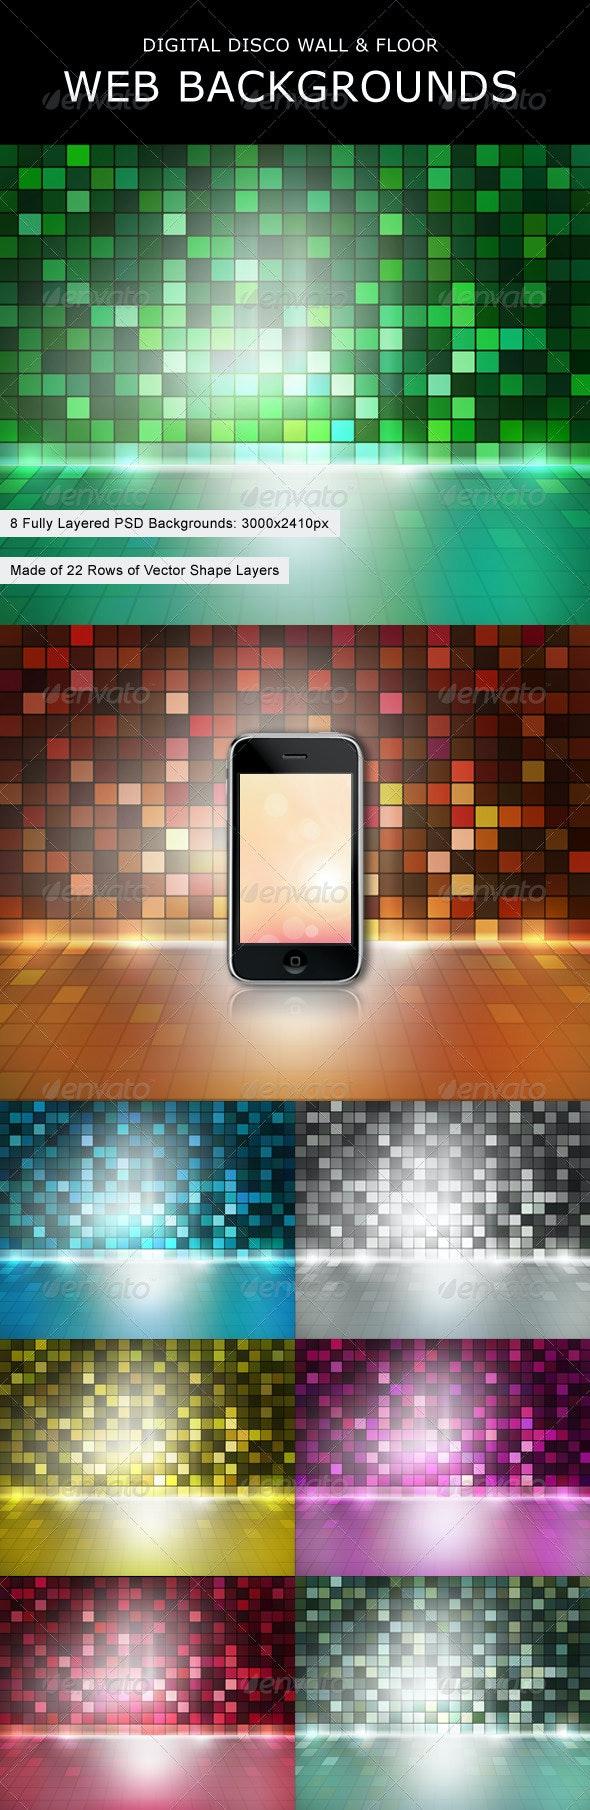 Digital Disco Wall & Floor Web Backgrounds - Backgrounds Graphics